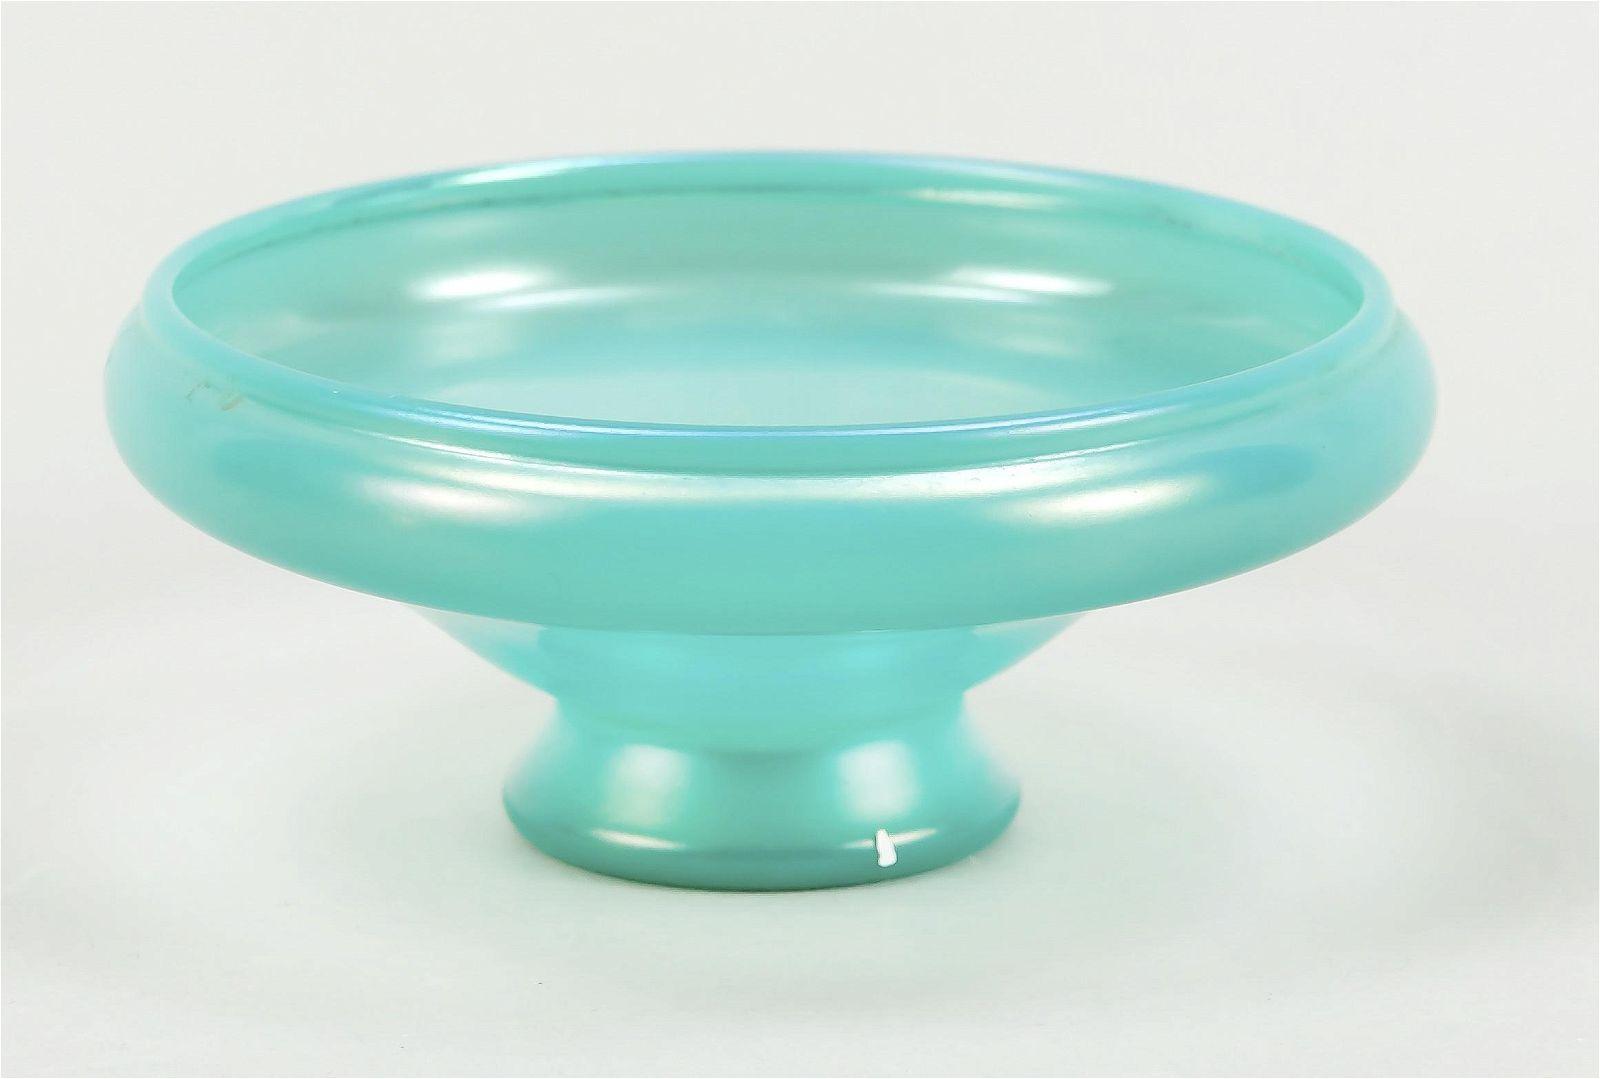 Round bowl, 2nd half of 20th century